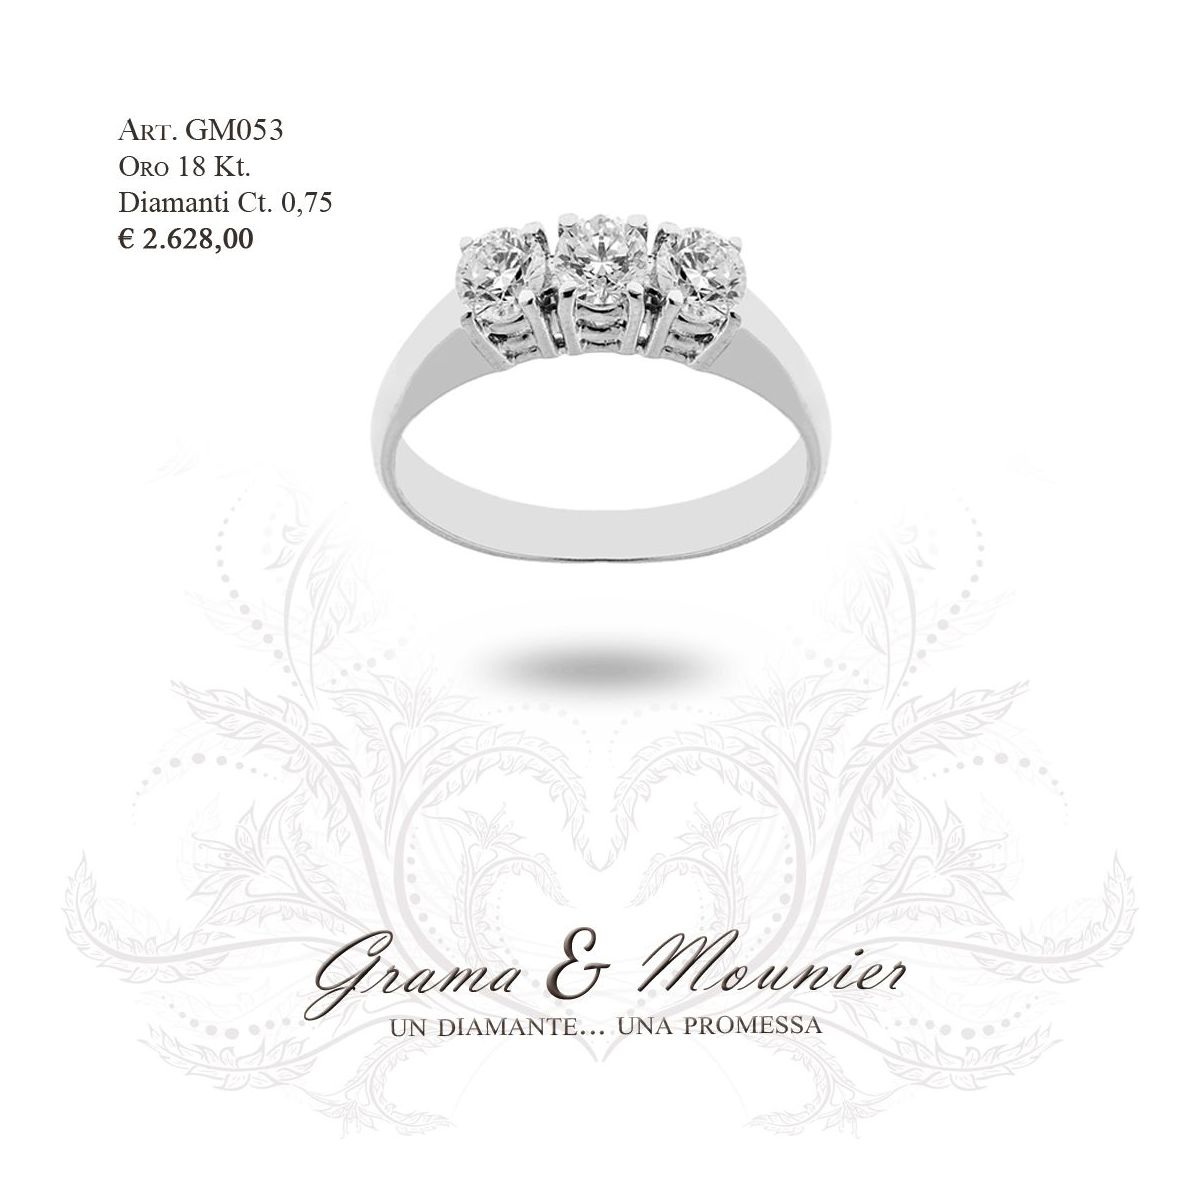 Anello in oro 18Kt. Grama&Mounier Art.GM053